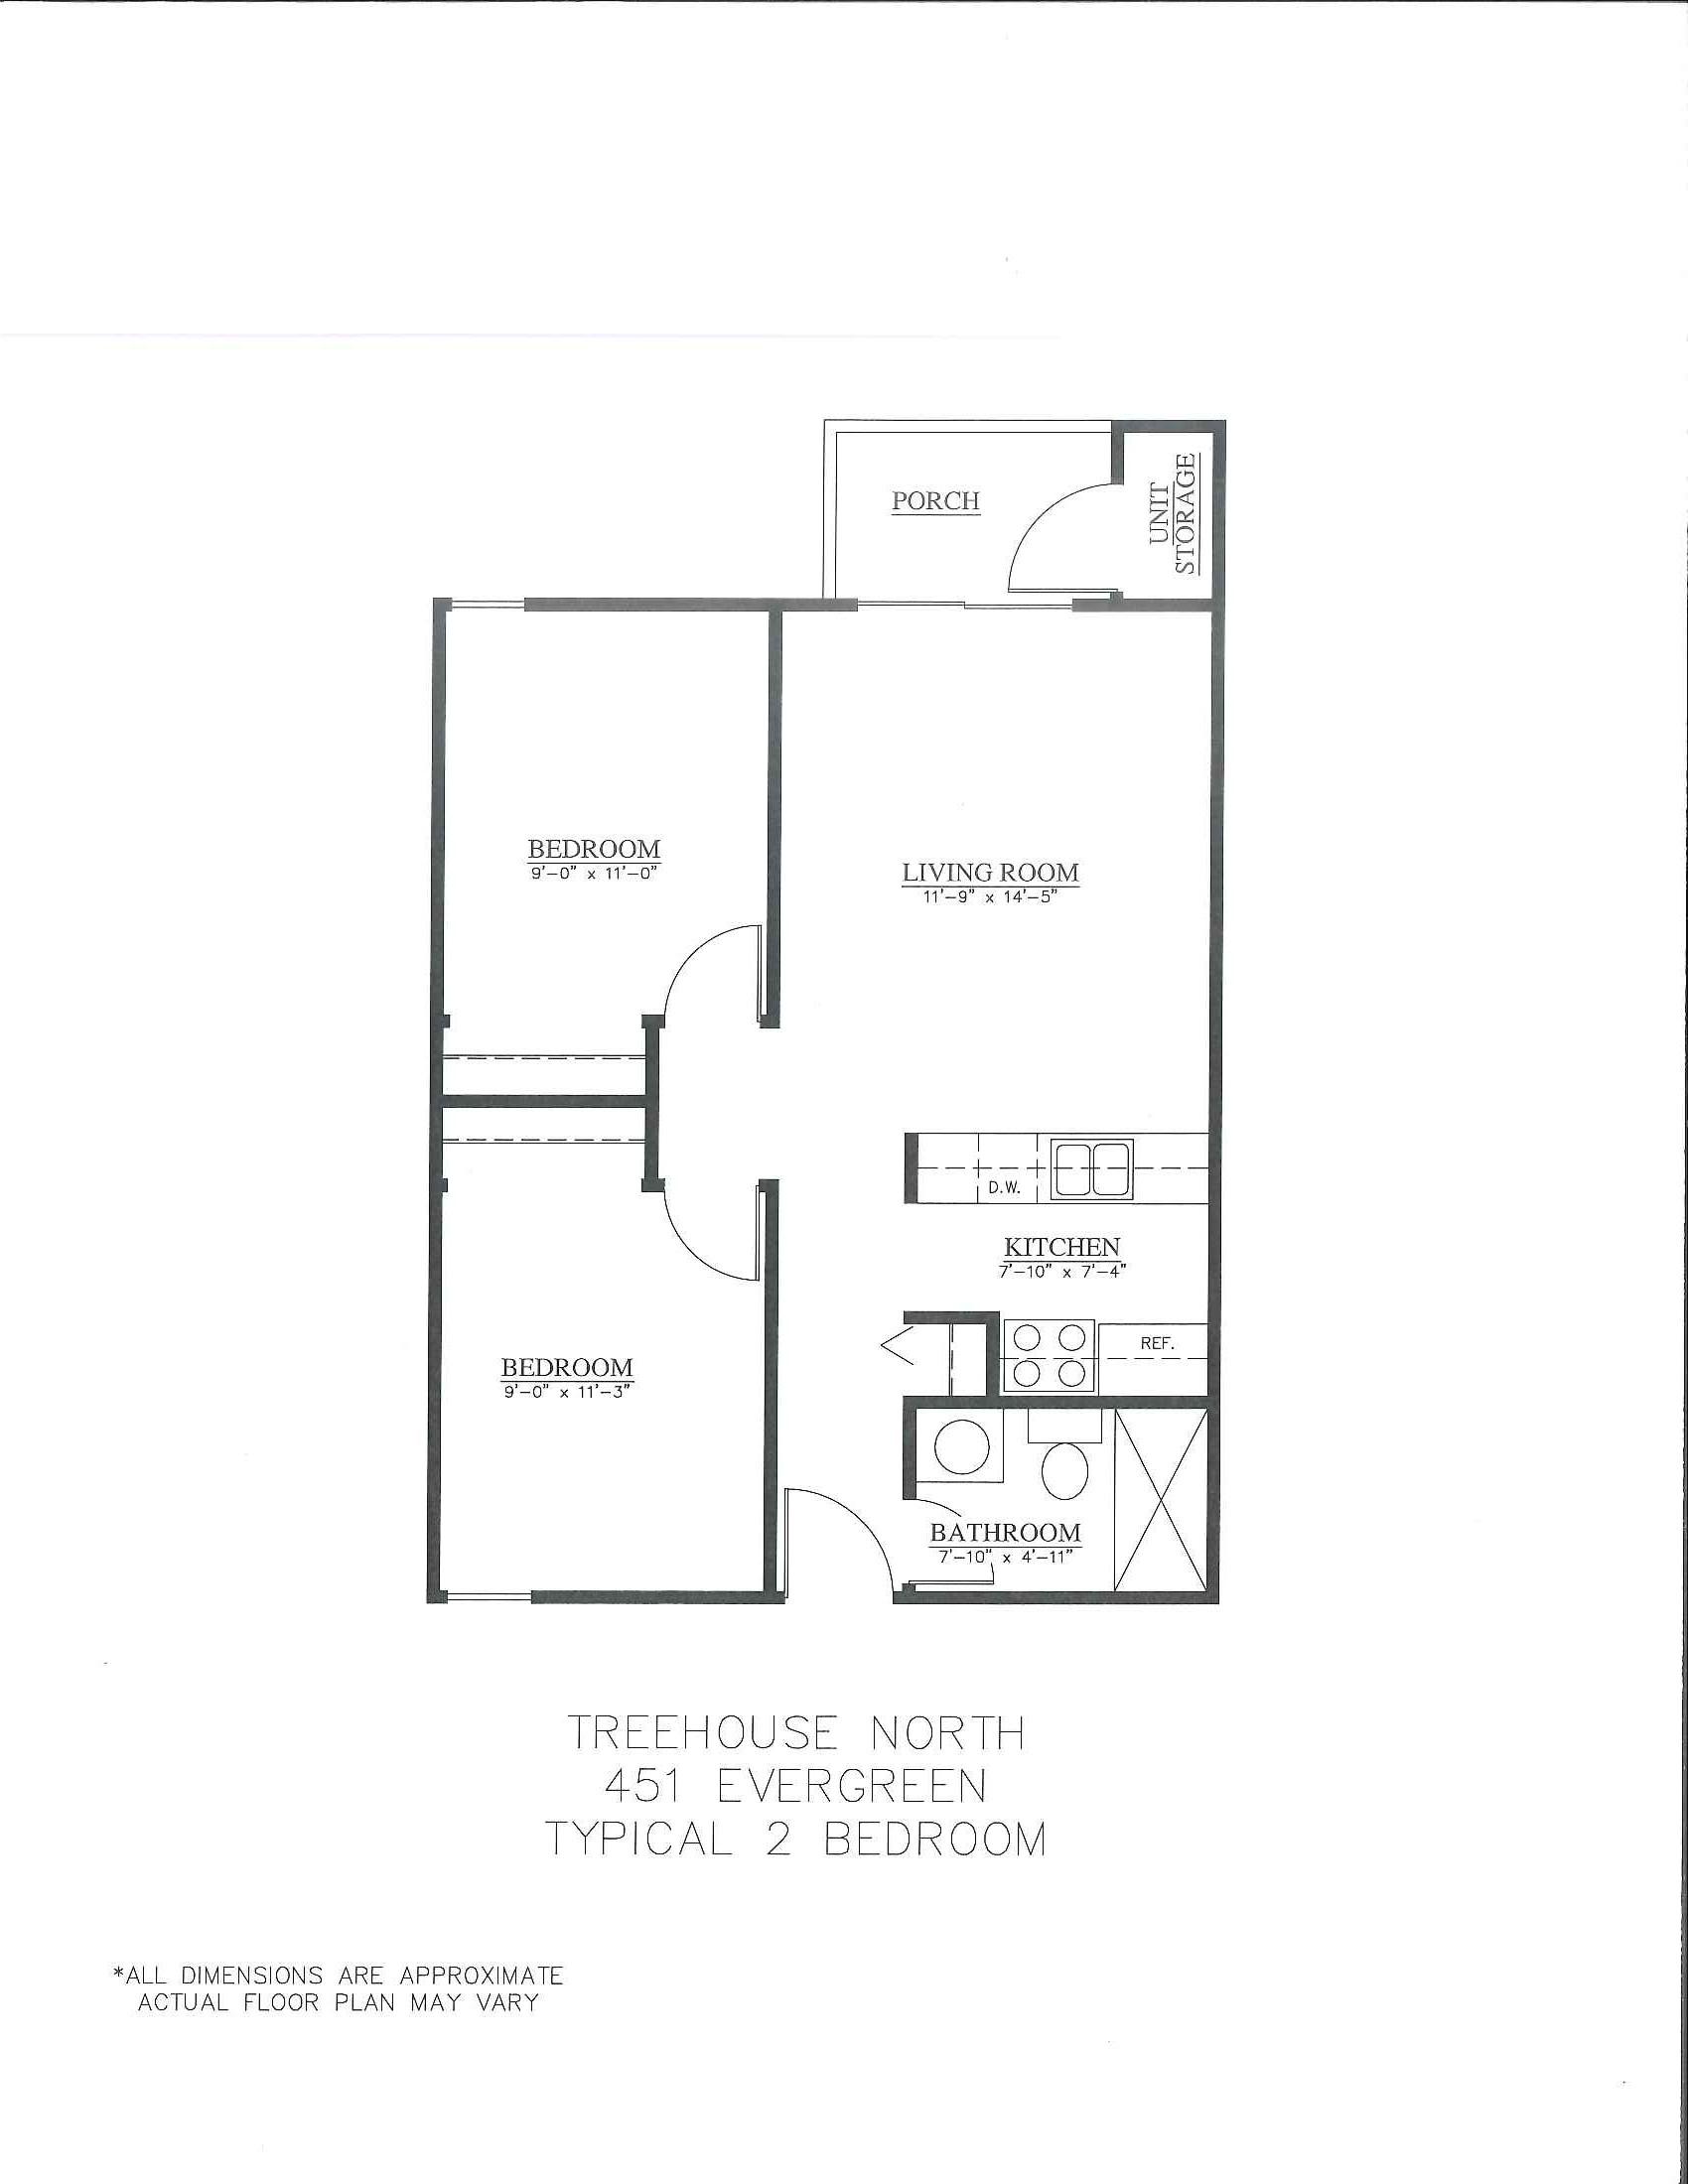 North 2 Bed Floorplan_0001.jpg